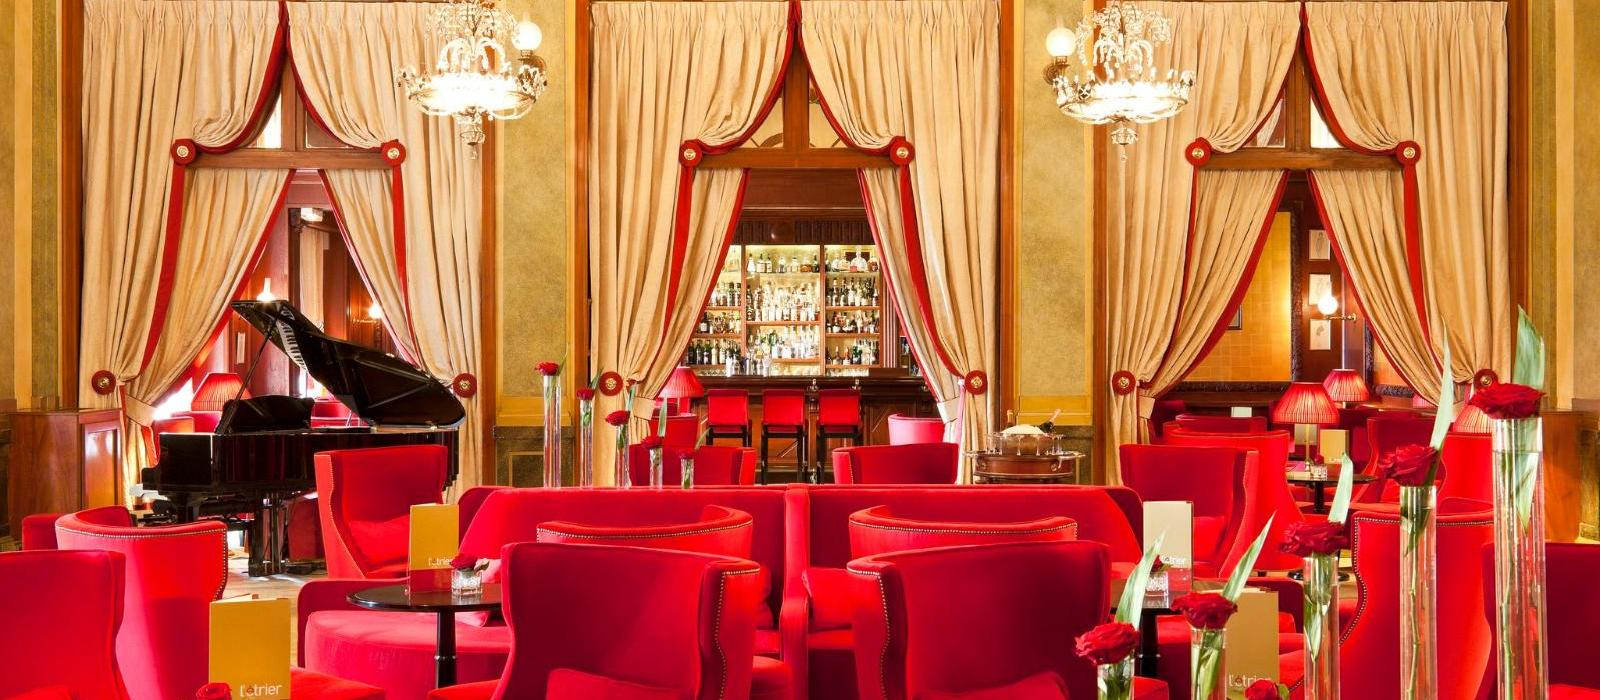 多维尔巴里耶尔皇家酒店(Hotel Barriere Le Royal Deauville) 图片  www.lhw.cn